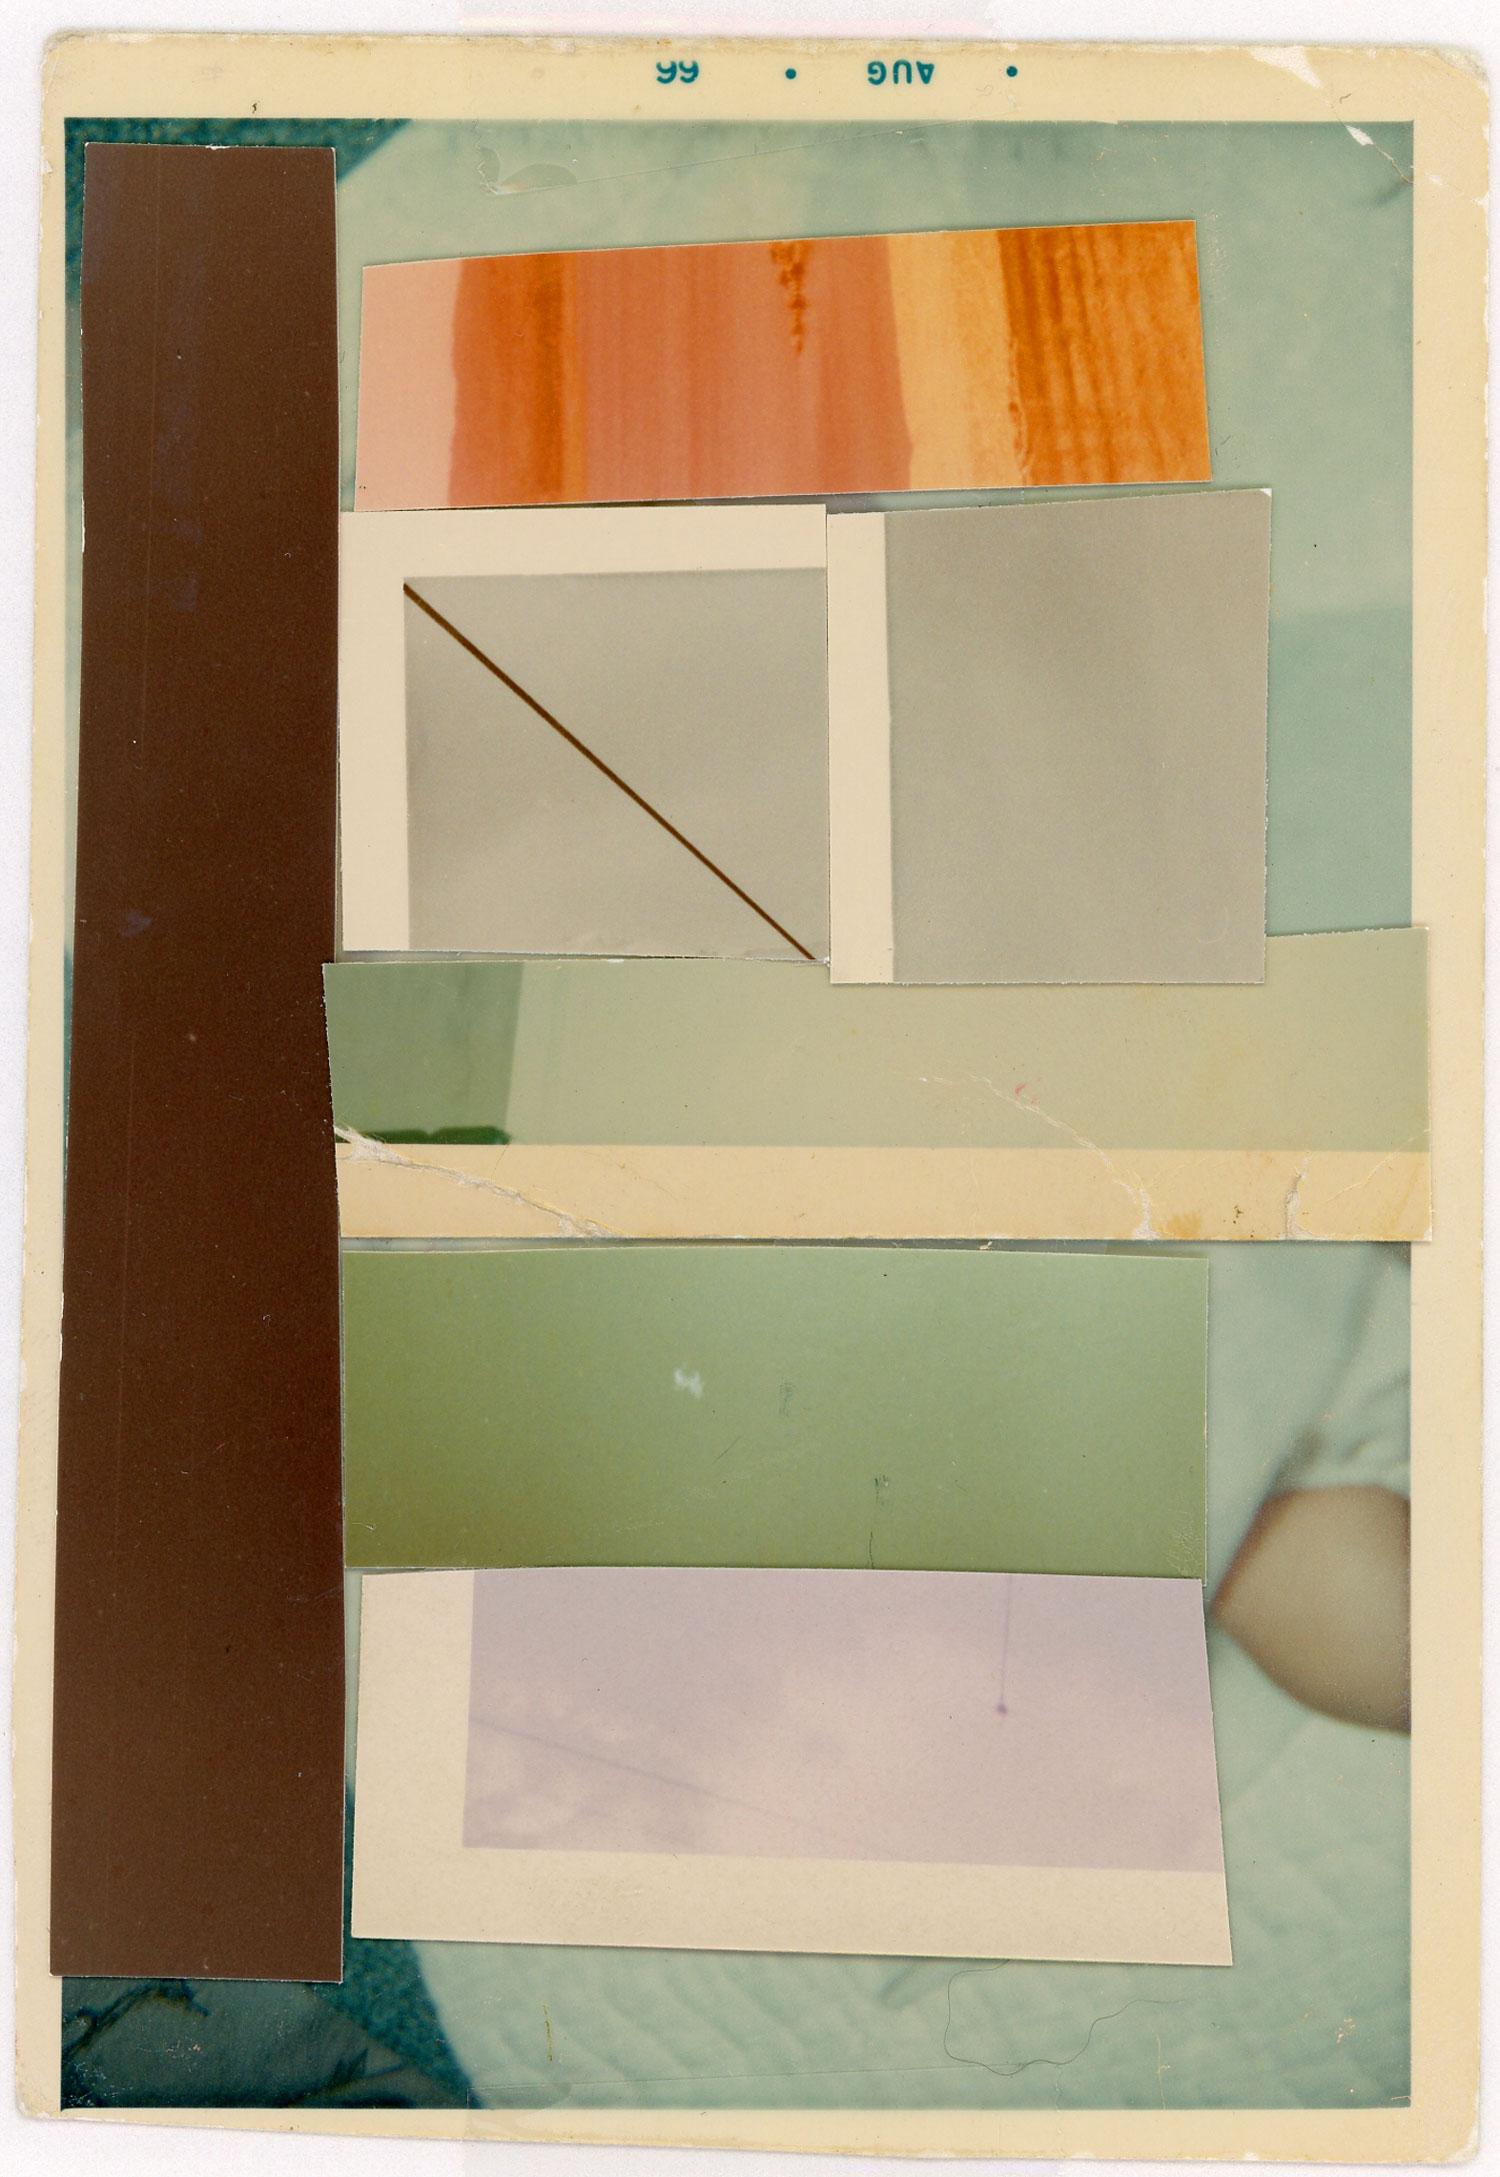 john-gall-collage-art-Untitled-1.jpg